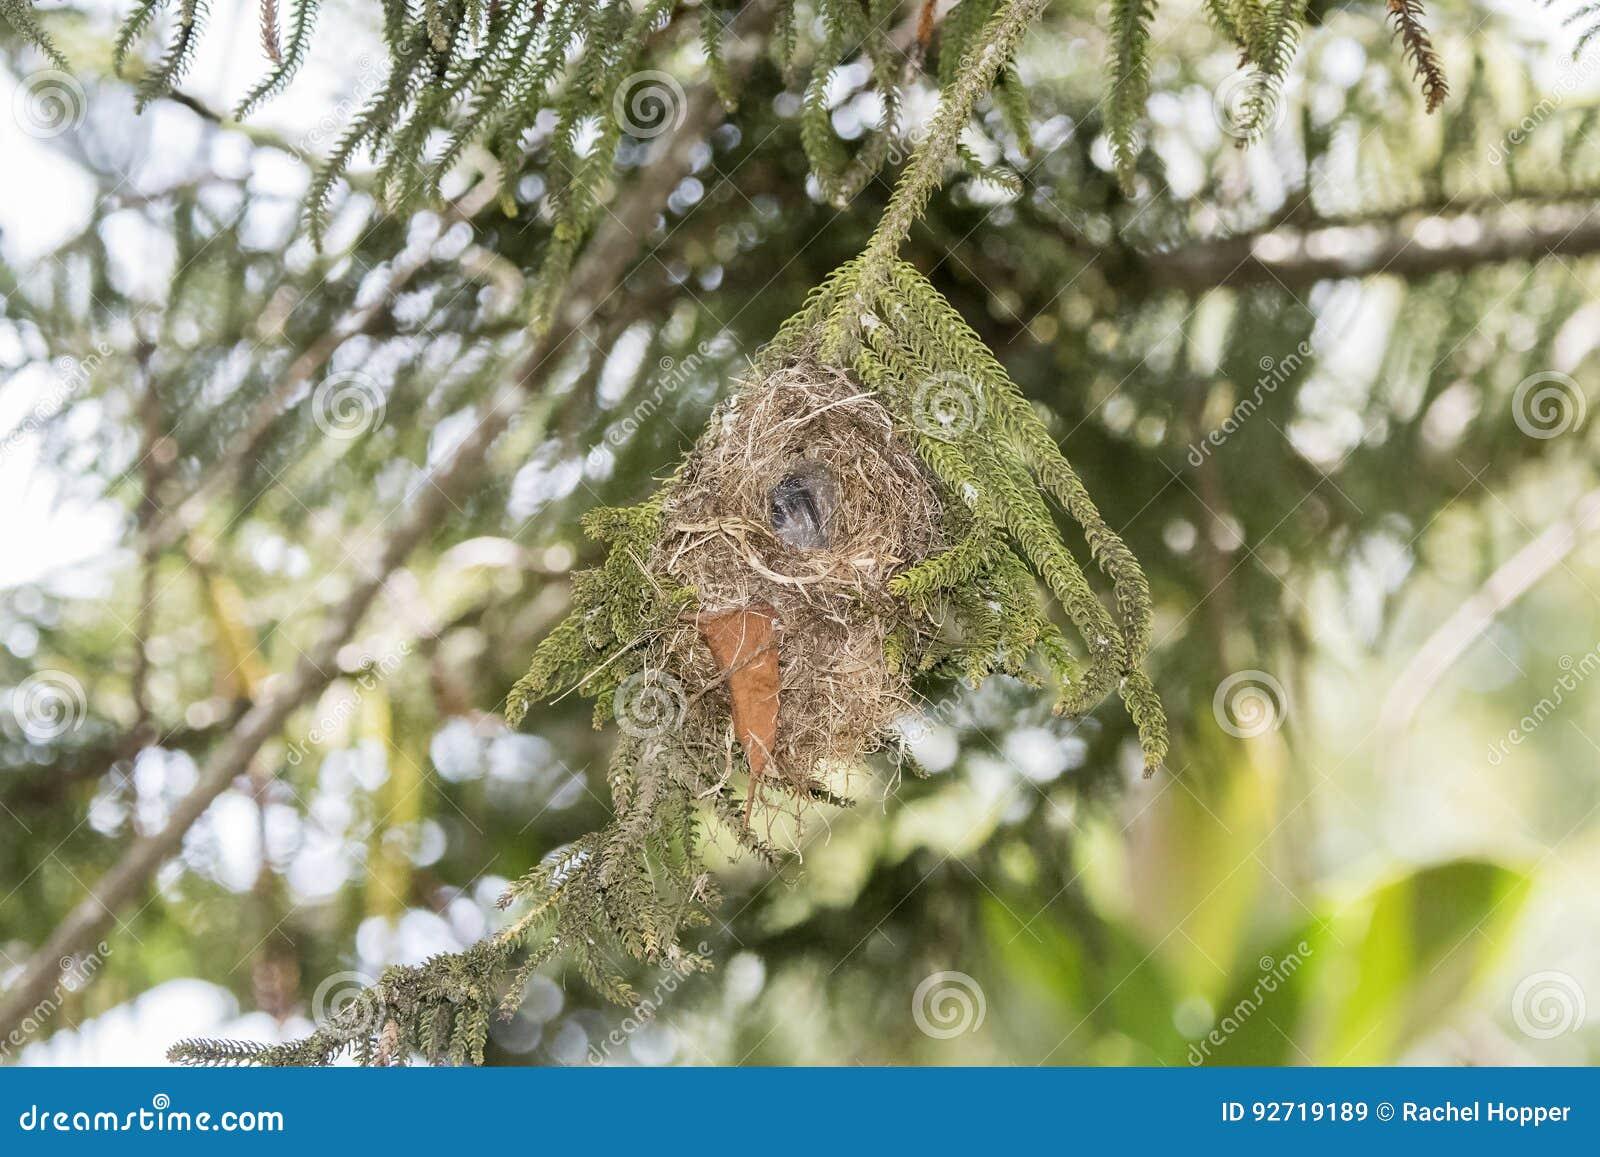 The Rare, Threatened, & Endemic Female Usambara Double-collared Sunbir